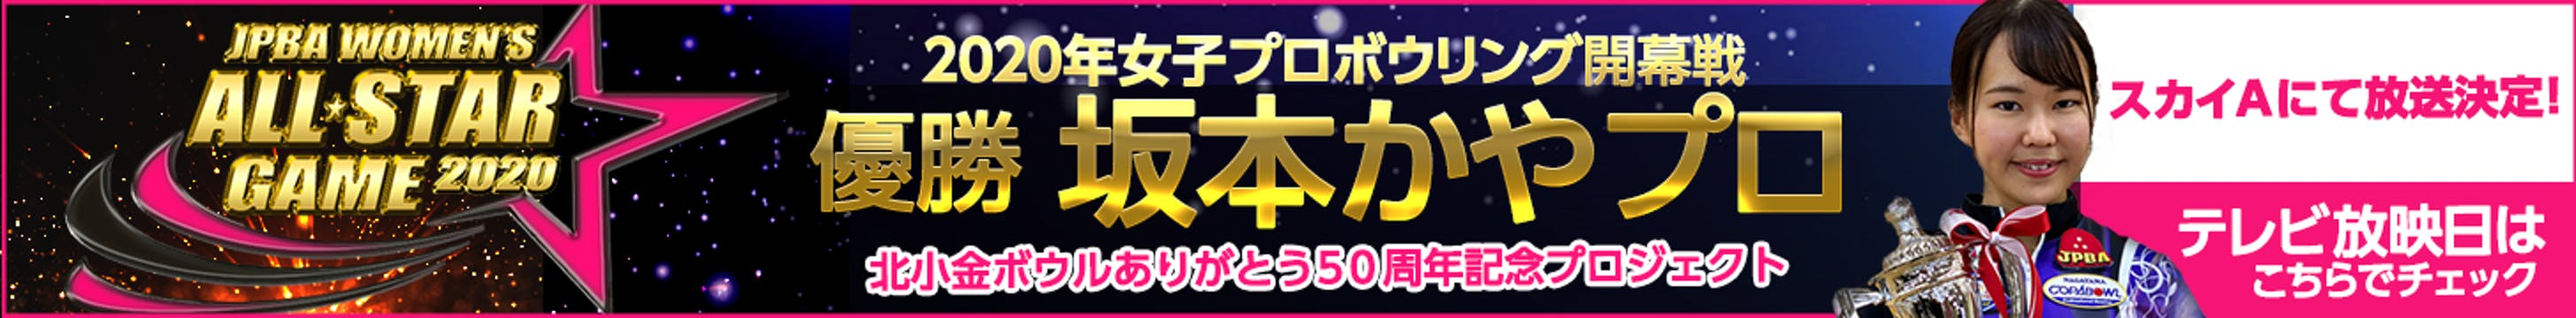 JPBA WOMEN'S ALL☆STAR GAME 2020